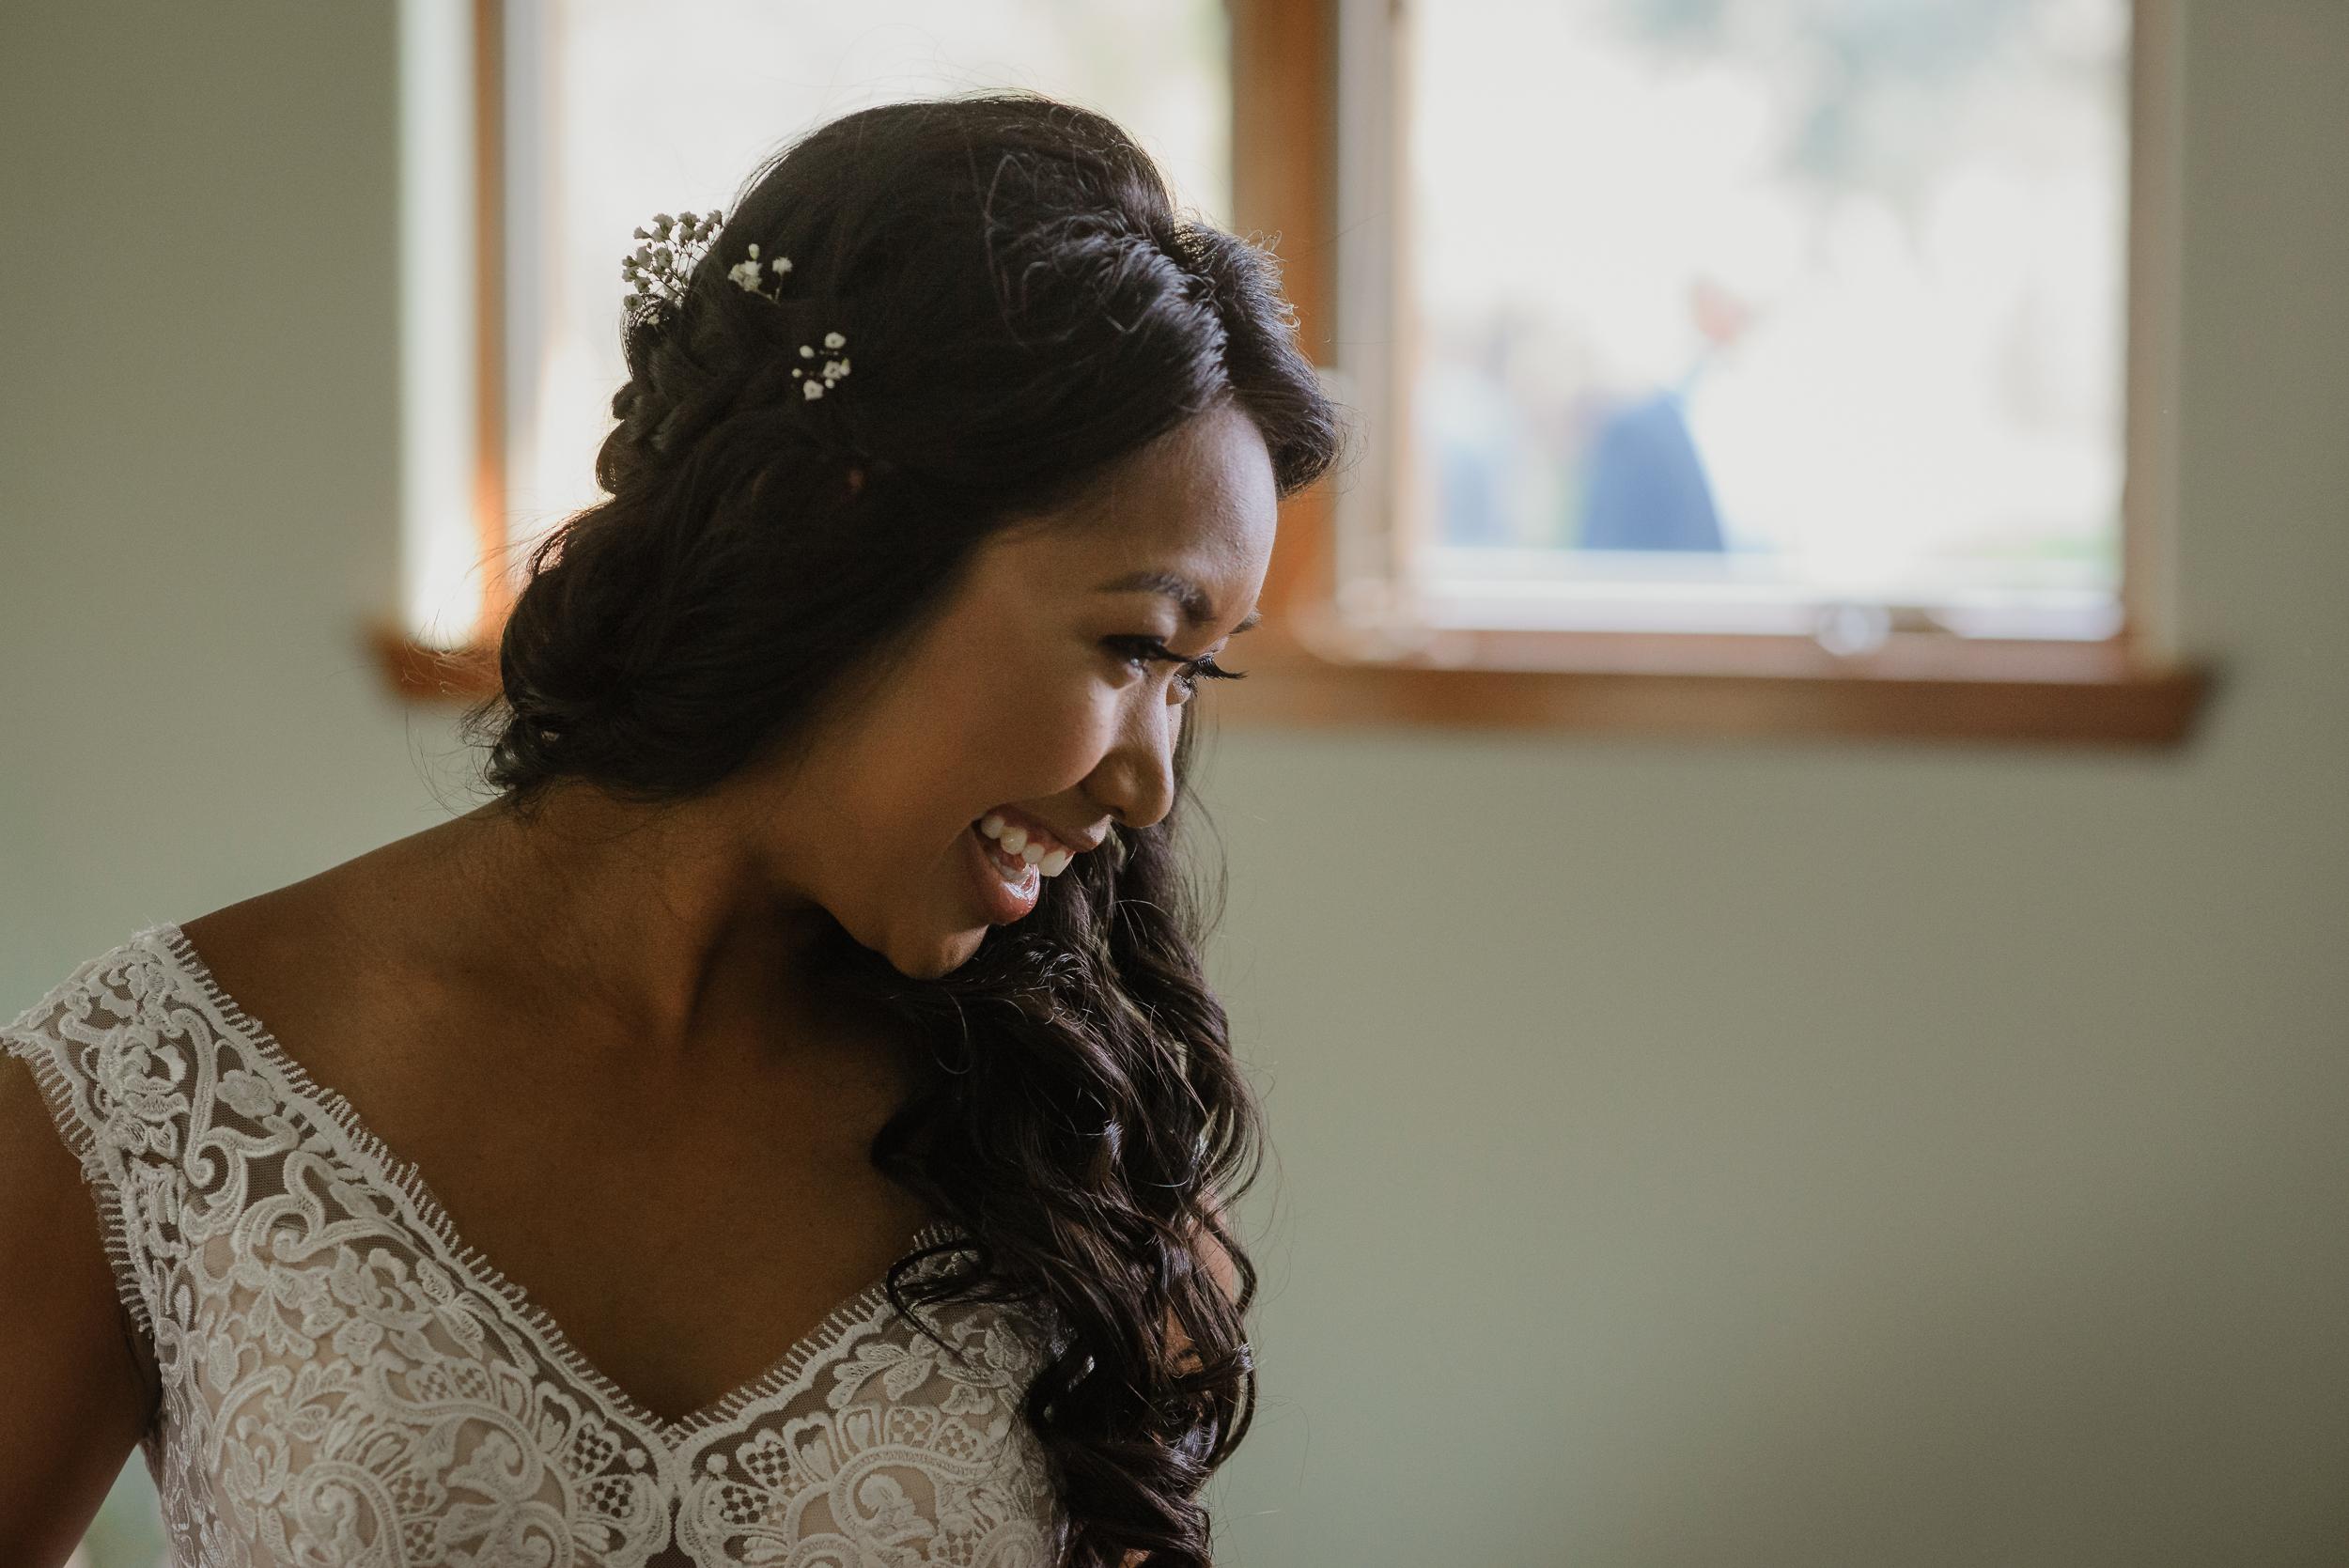 012marin-petaluma-backyard-wedding-vivianchen-101.jpg